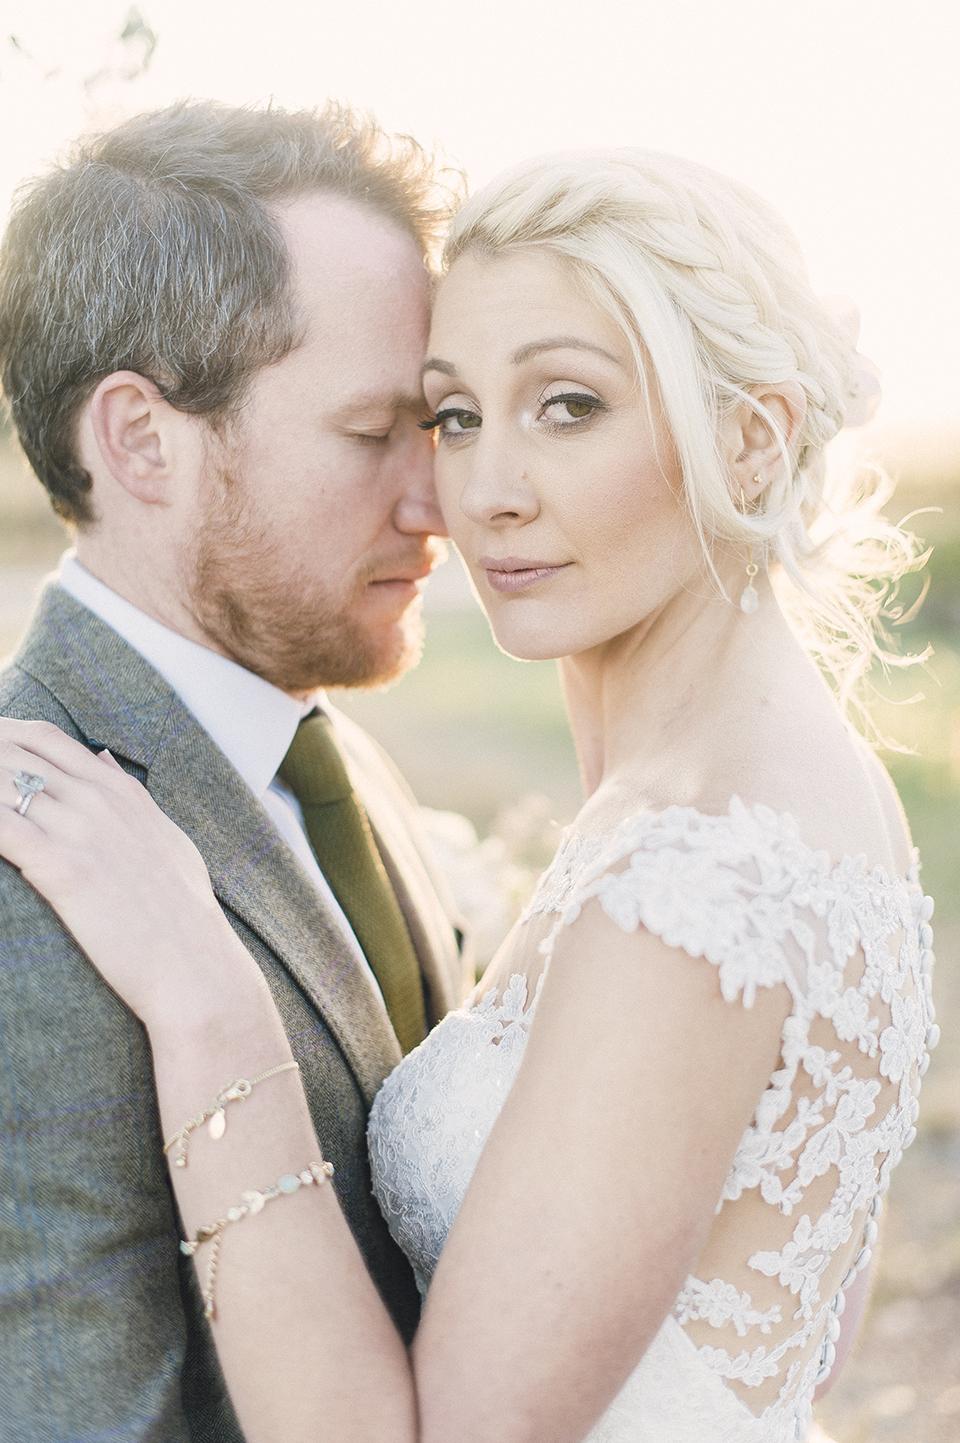 RyanParker_WeddingPhotographer_FineArt_CapeTown_Robertson_PatBusch_Hermanus_M&S_DSC_3518.jpg